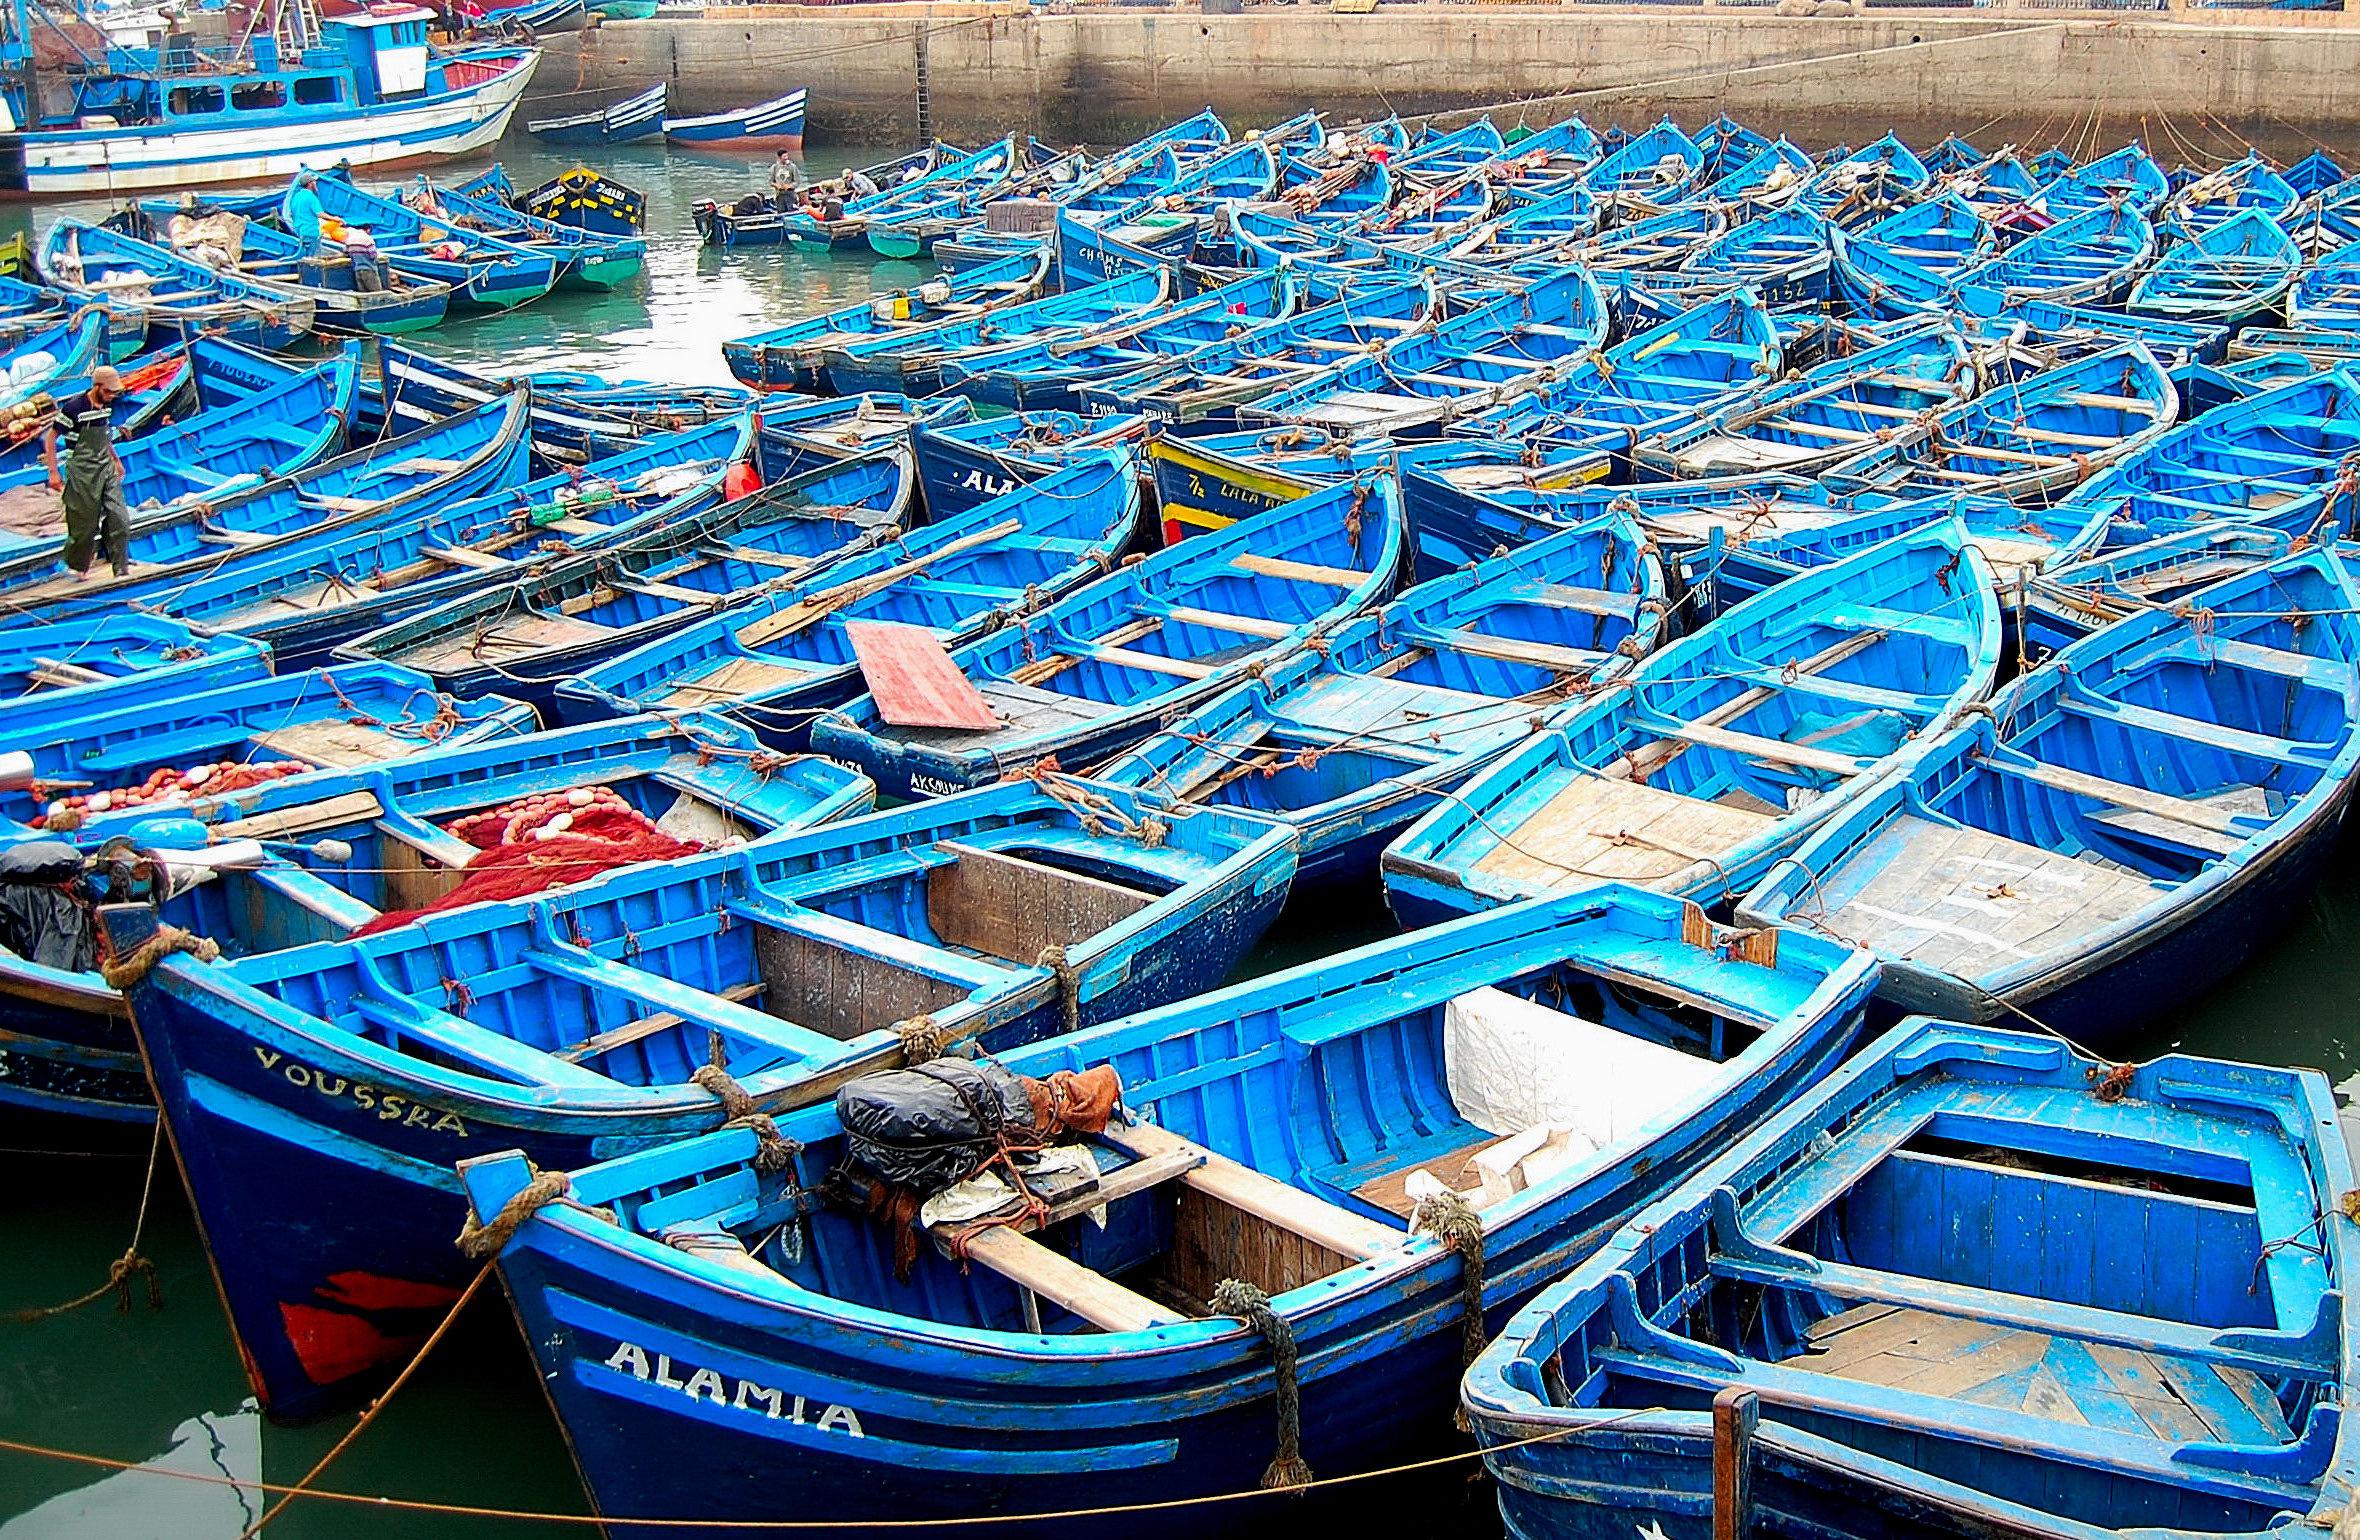 Morocco: Complete mooring in Essaouira...